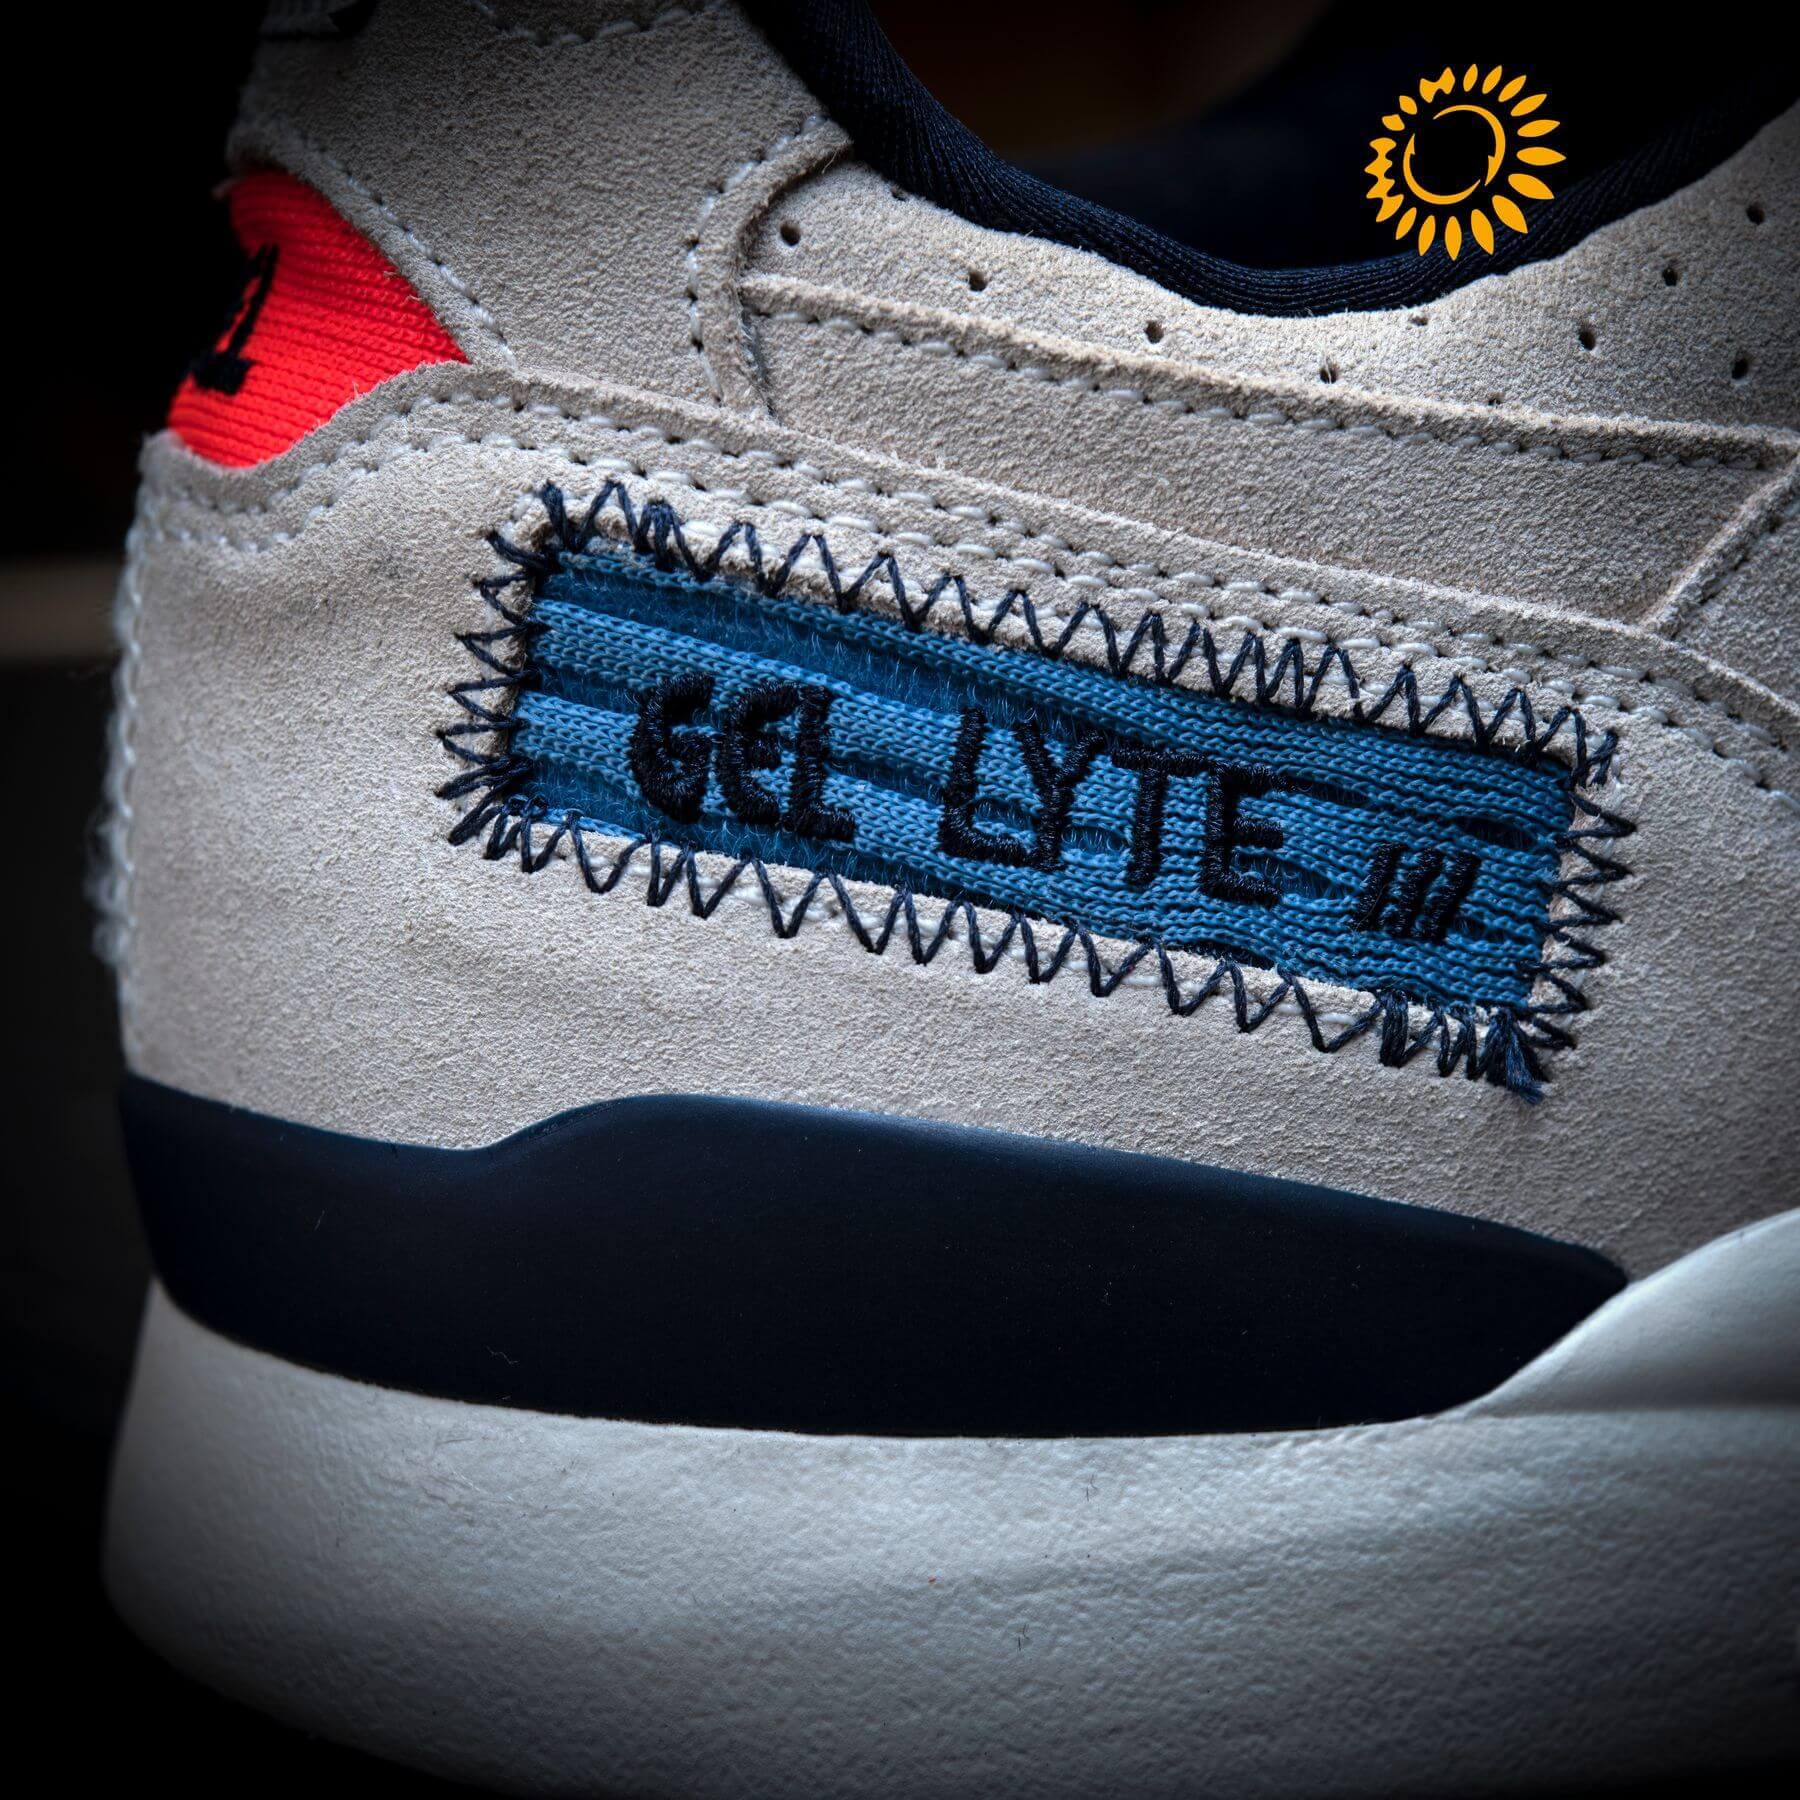 "details heel area - ASICS- GEL-LYTEIII OG - ""Patchwork""- birch/birch - 1203A133.200"